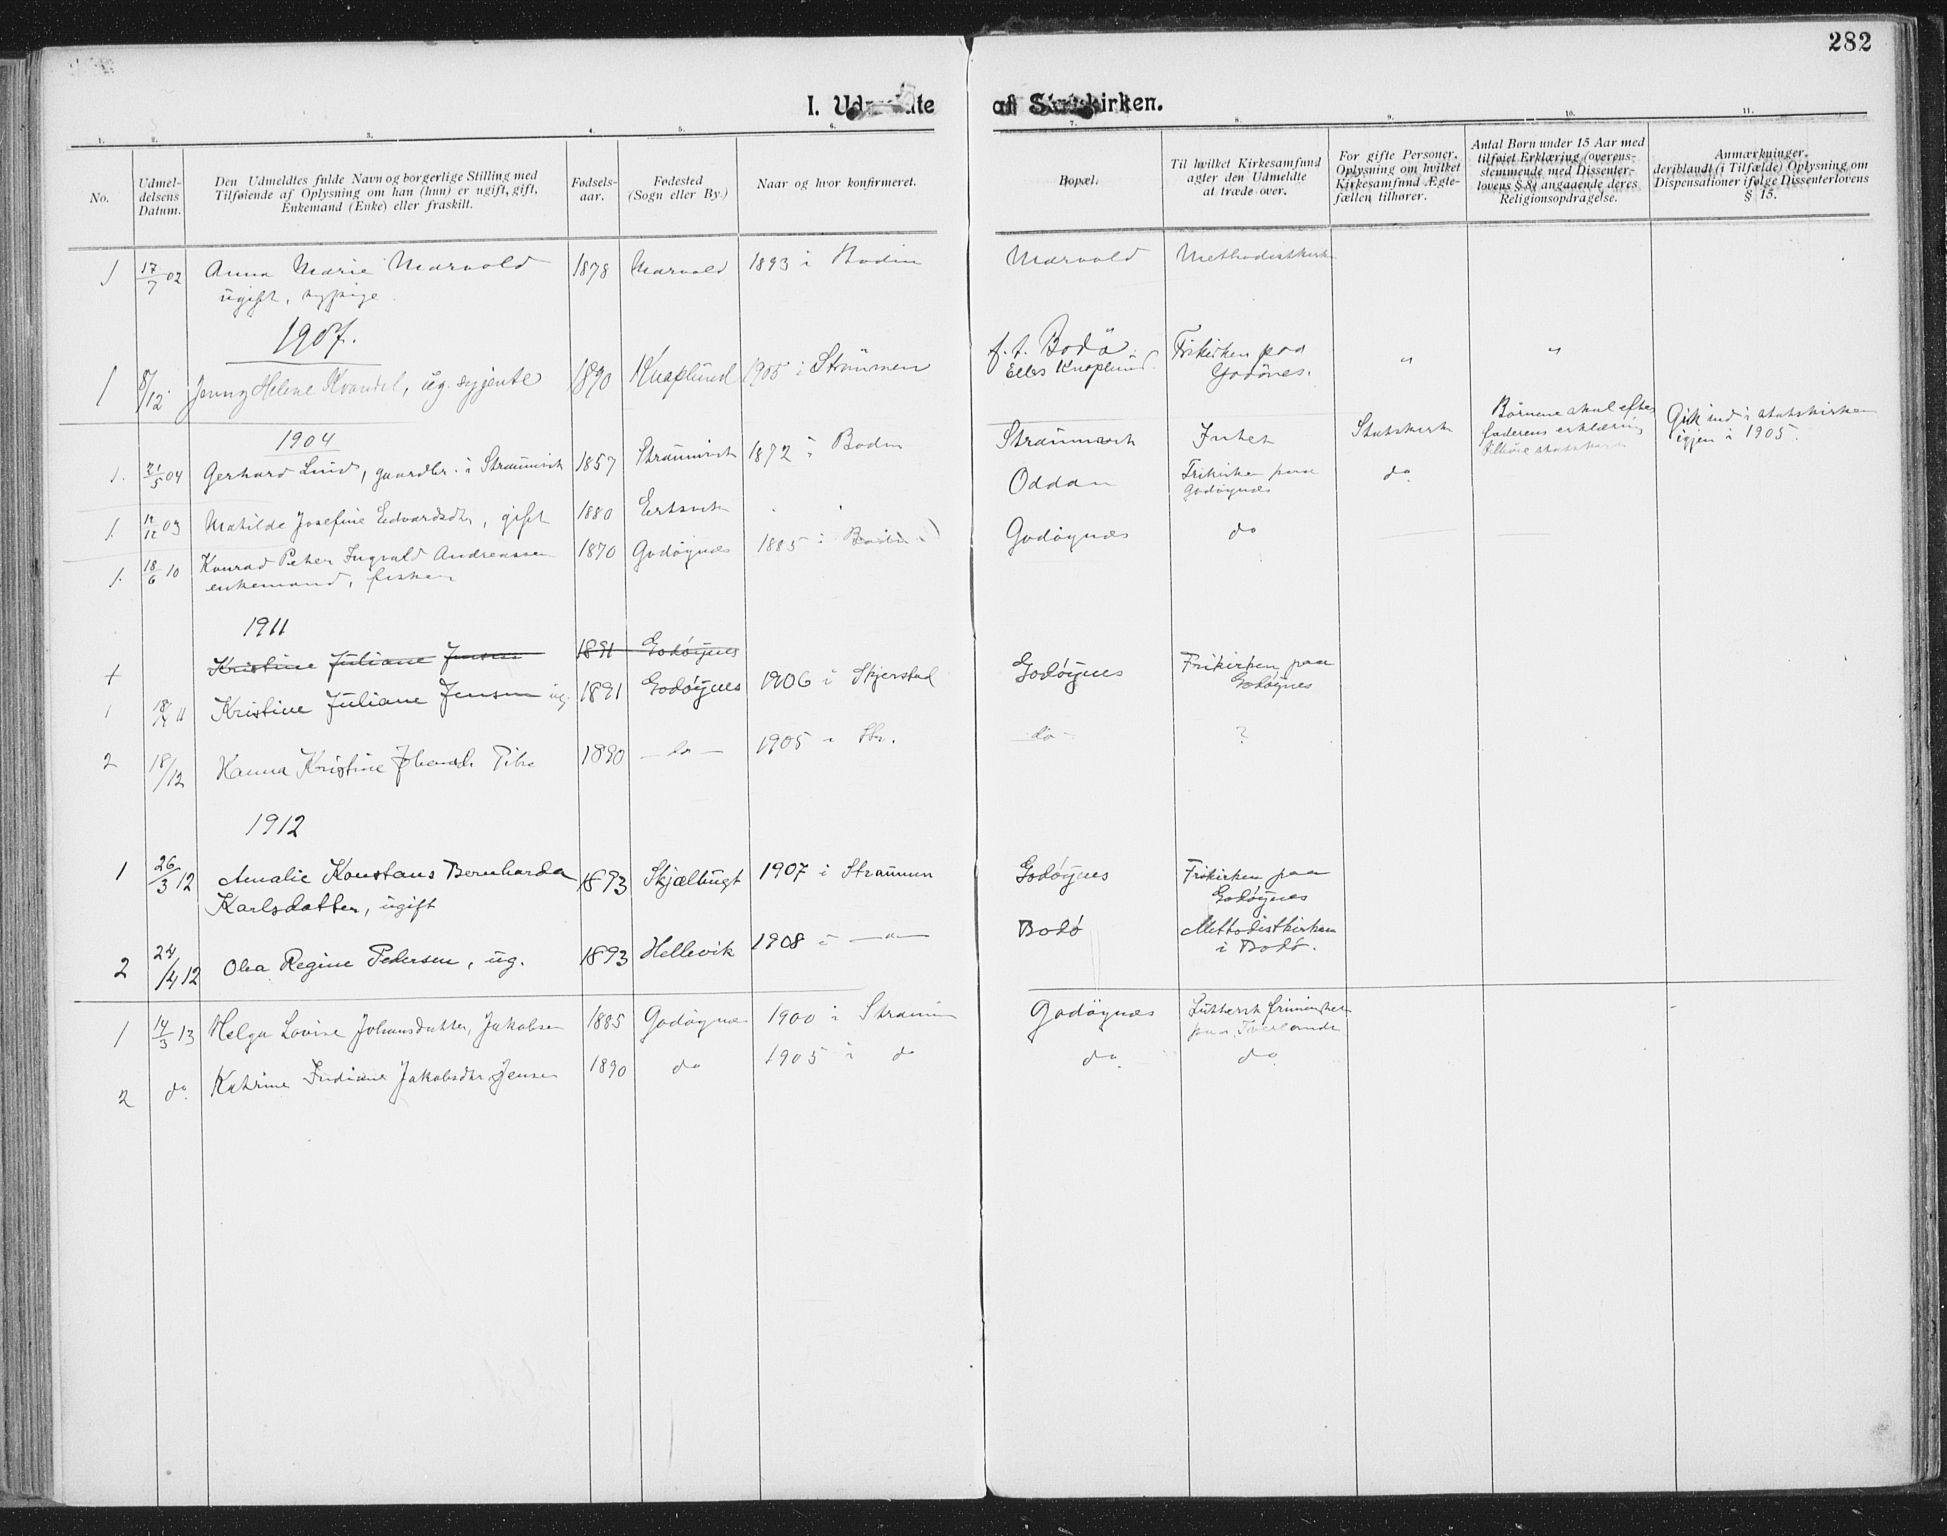 SAT, Ministerialprotokoller, klokkerbøker og fødselsregistre - Nordland, 804/L0081: Ministerialbok nr. 804A02, 1901-1915, s. 282